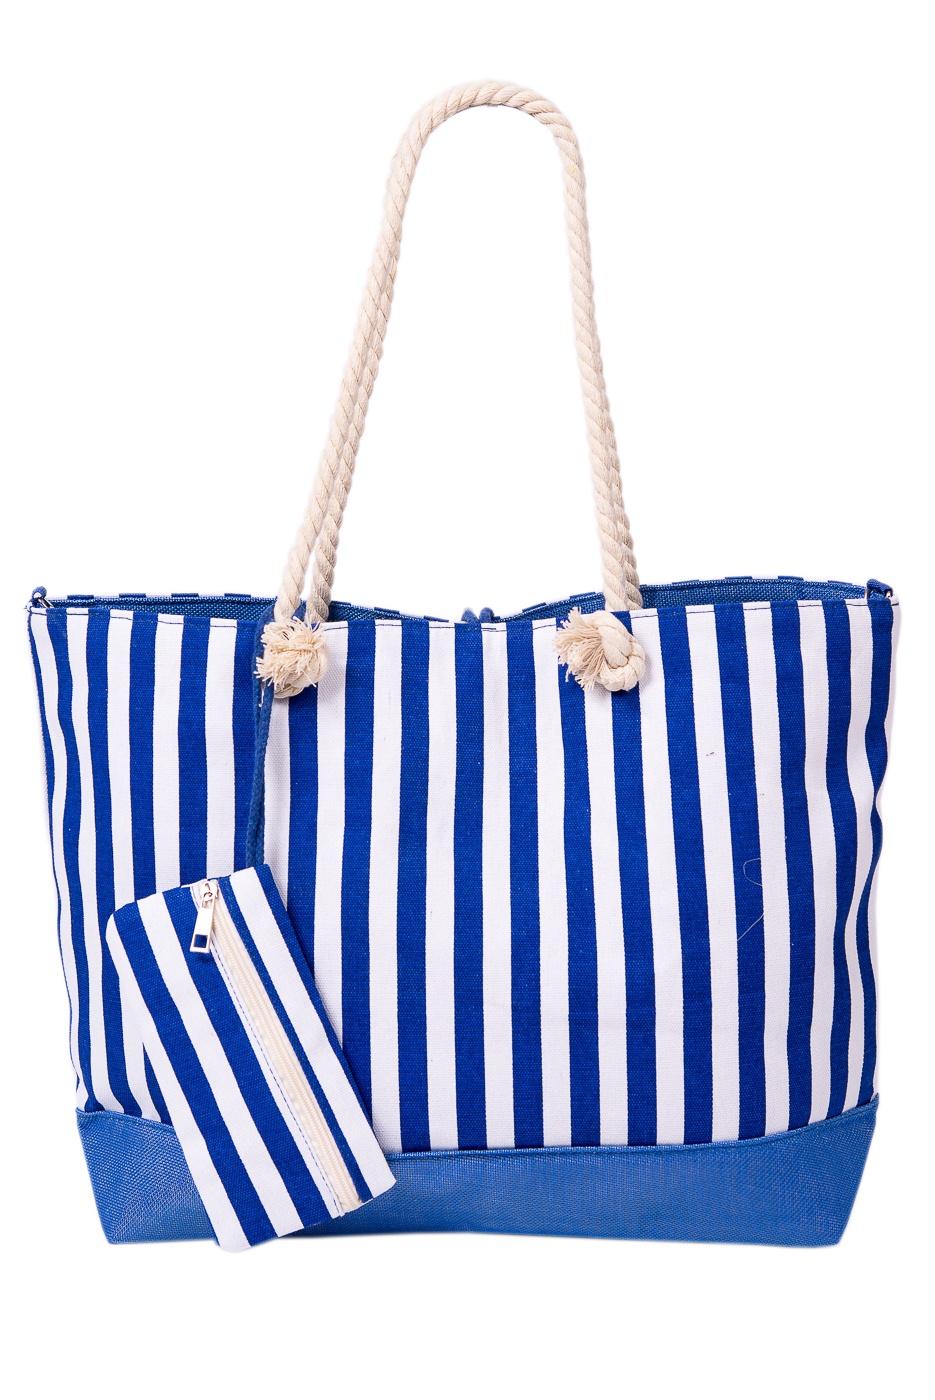 пляжная пластиковая сумка фото